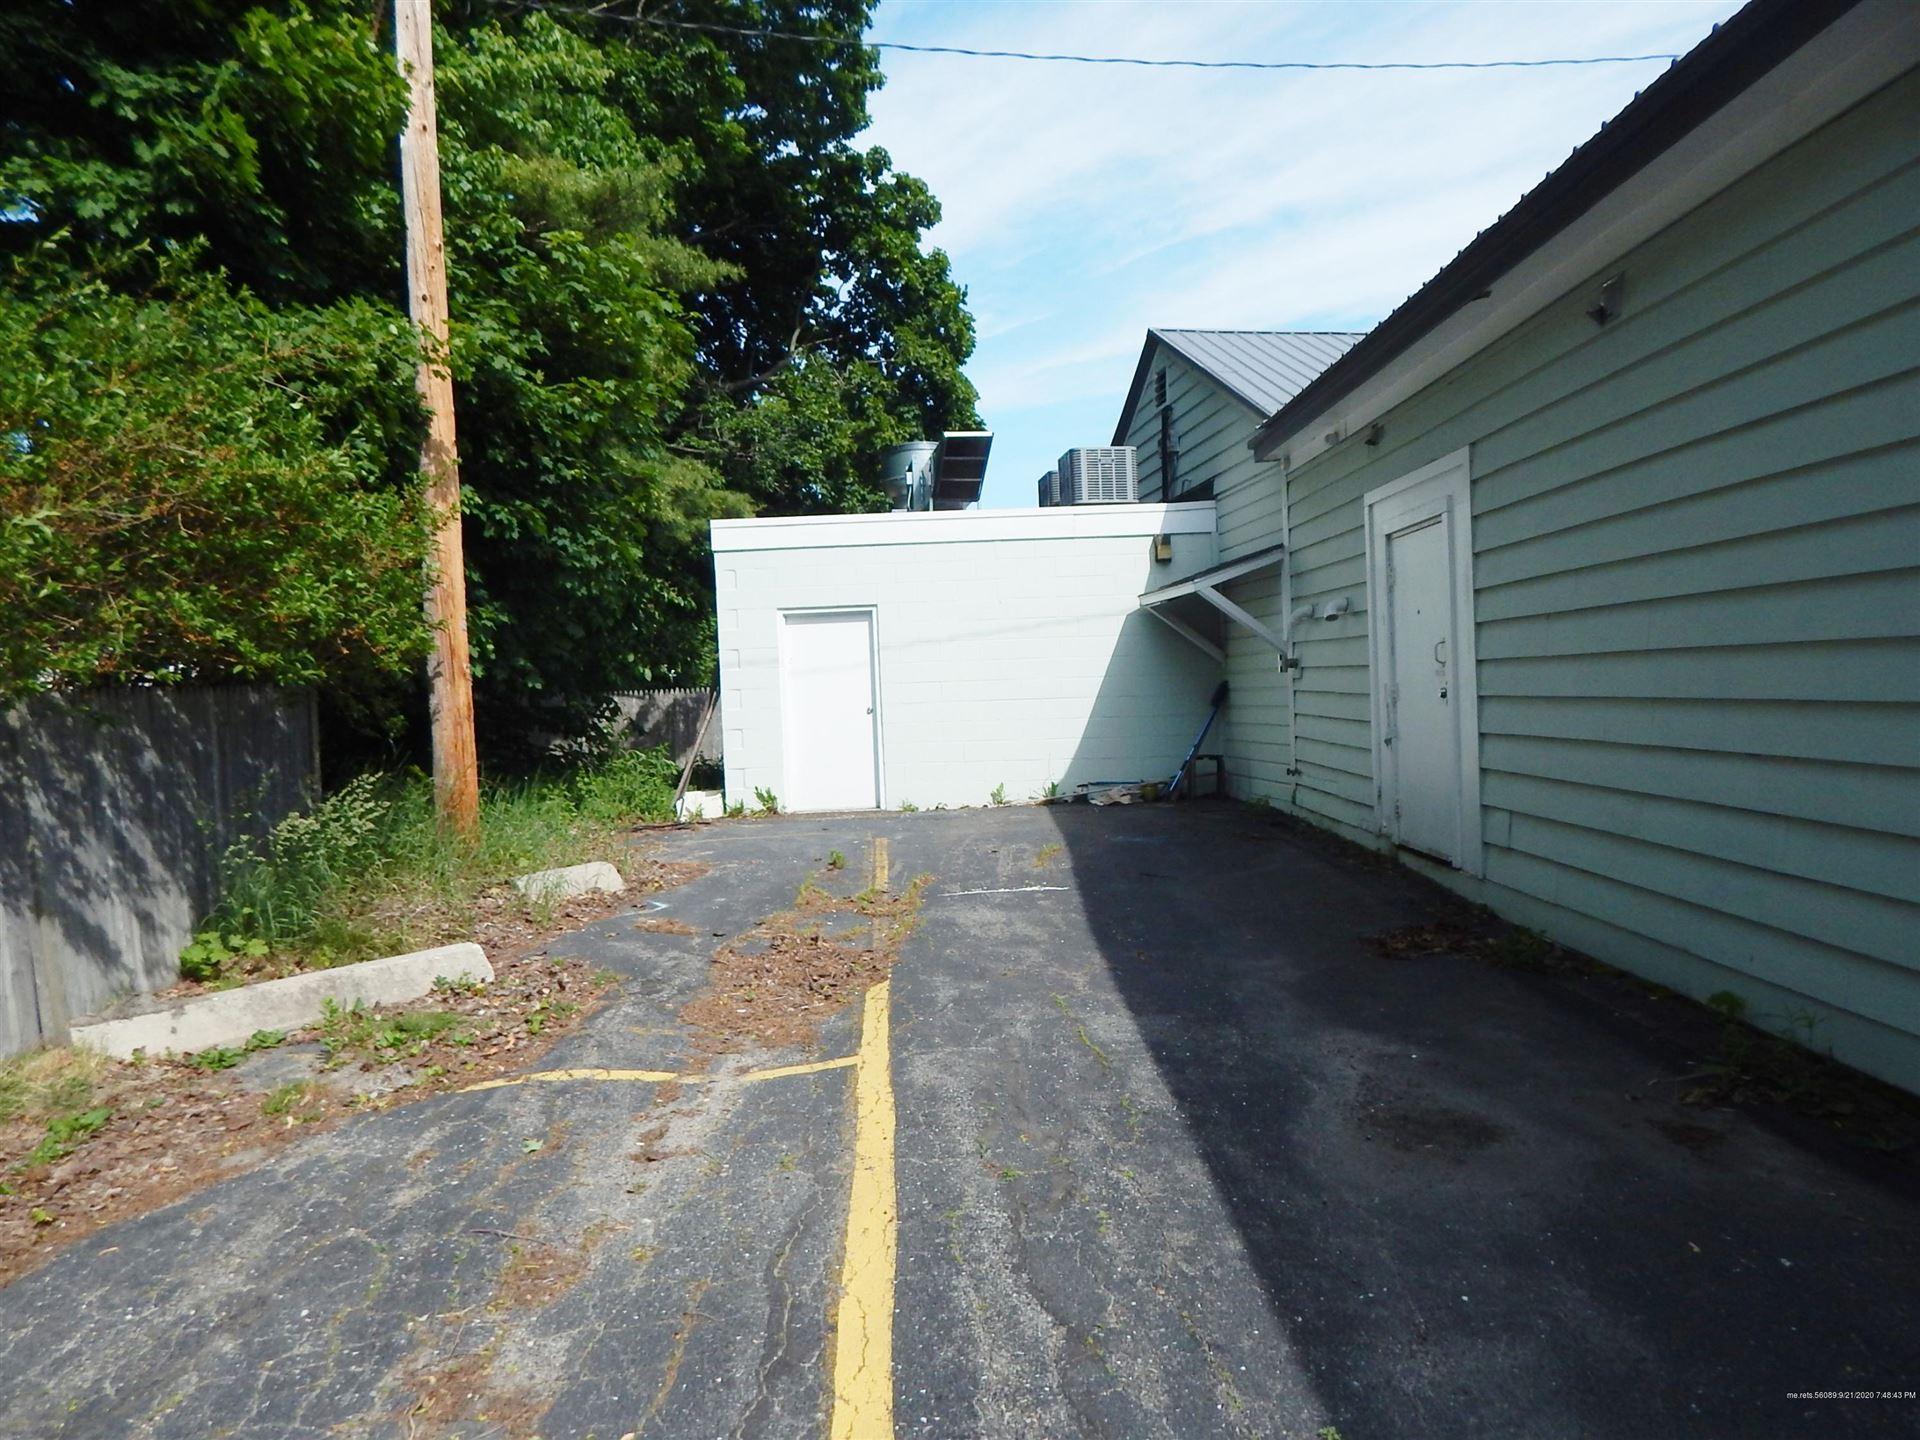 Photo of 1281-1283 Congress Street, Portland, ME 04102 (MLS # 1469764)